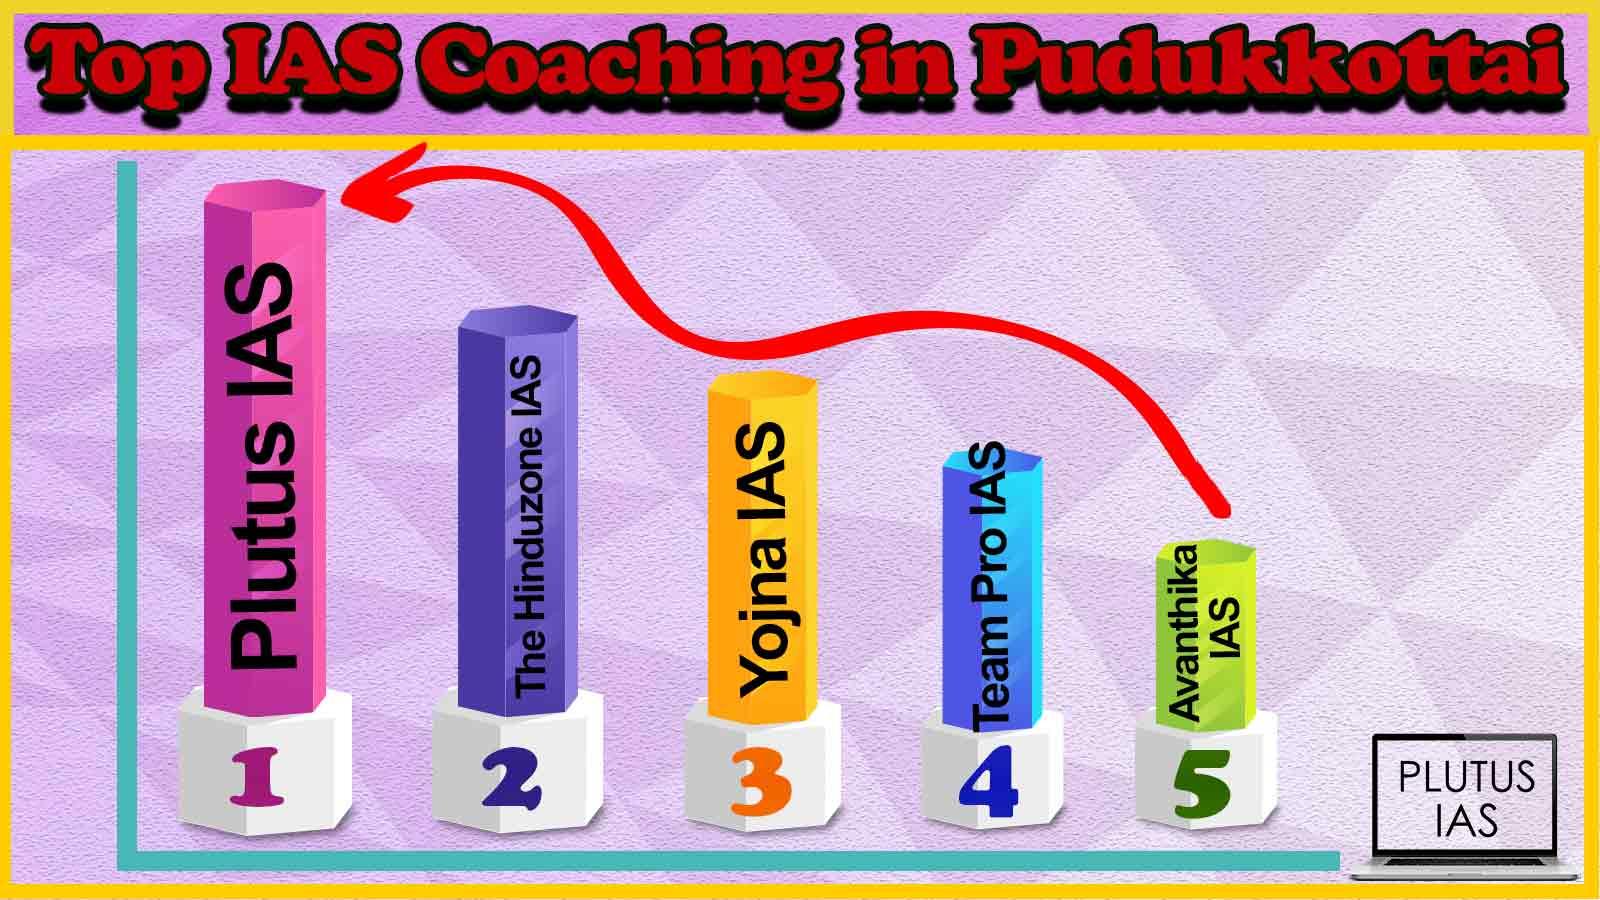 Best 10 IAS Coaching in Pudukkottai